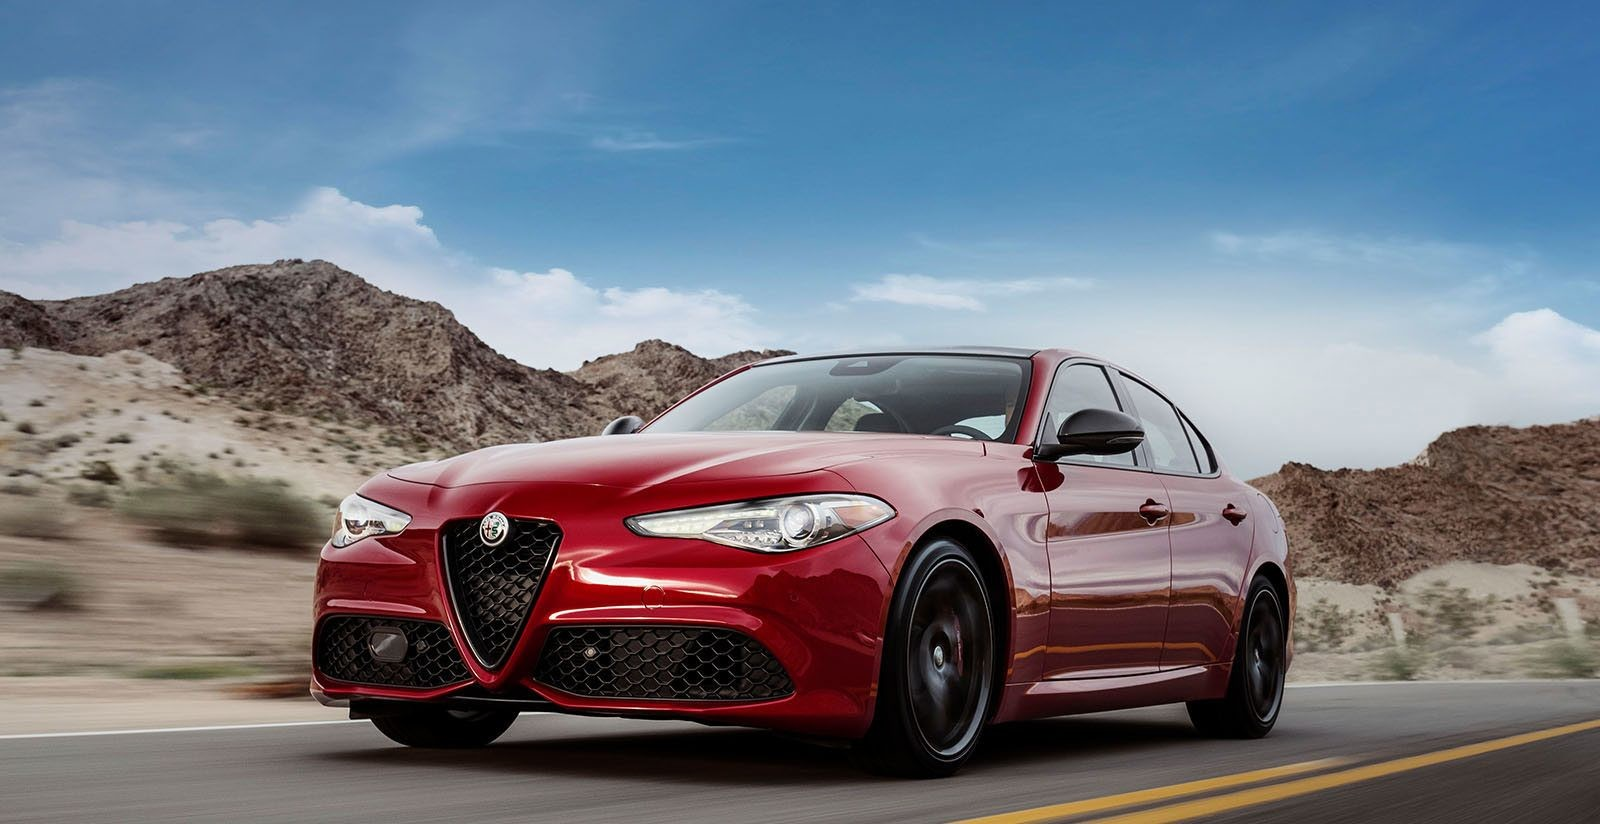 2018 Alfa Romeo Giulia Luxury Sport Sedan